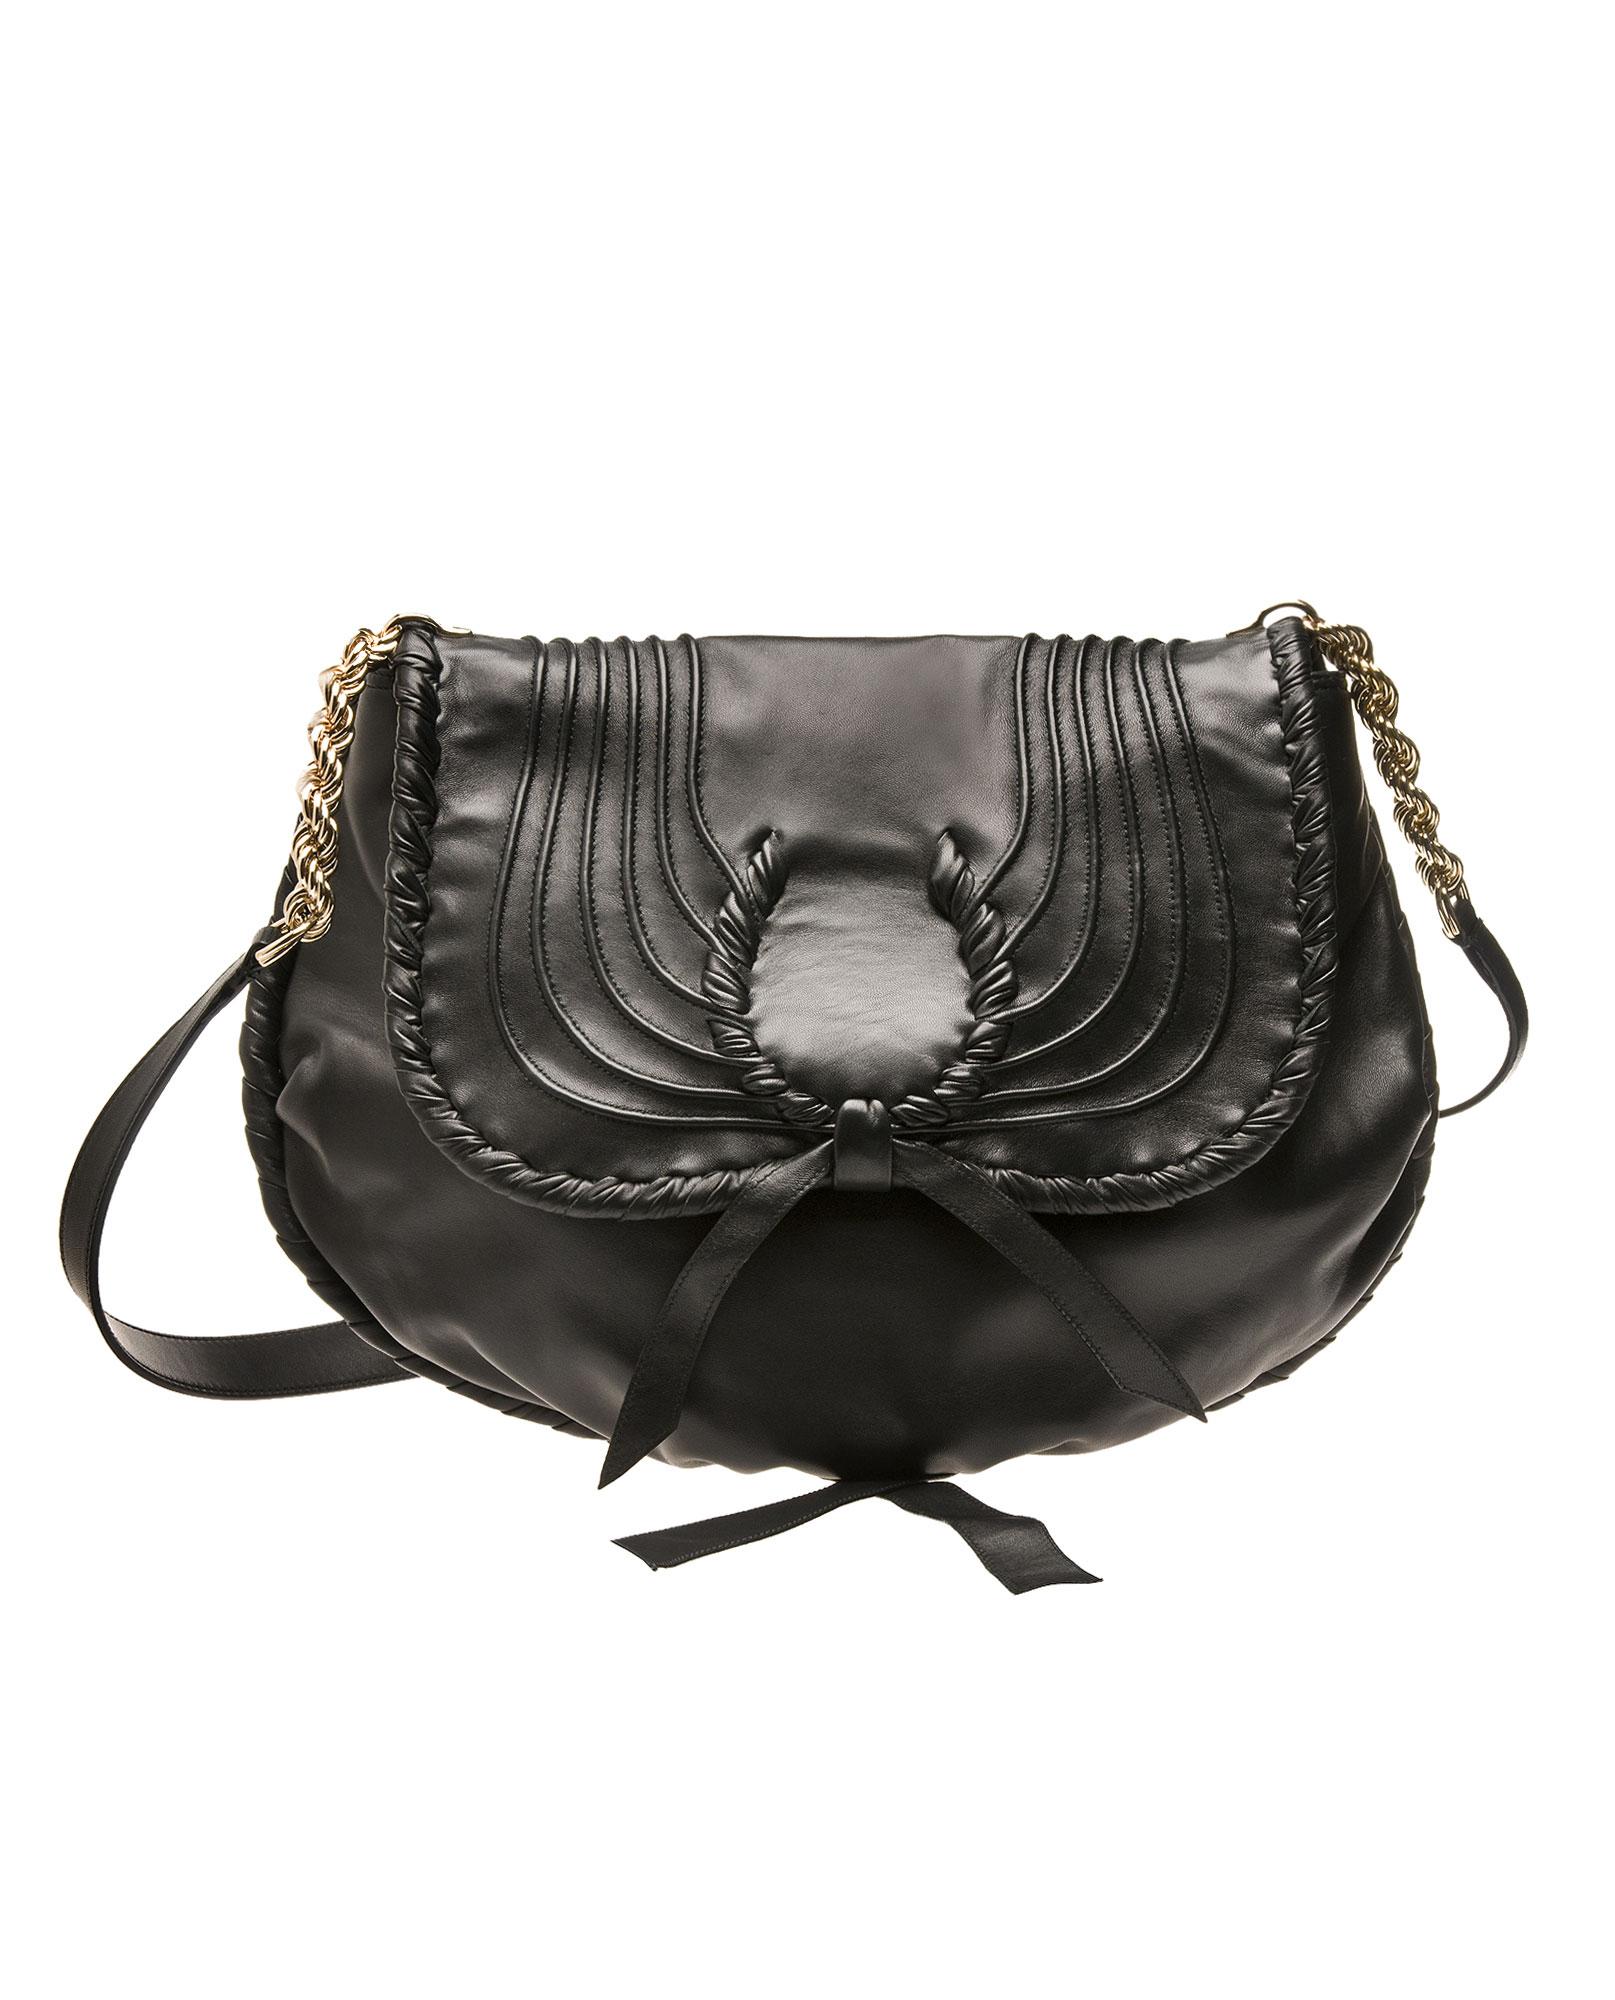 ec9614d685ae Nina Ricci Sac Rabat Leather Messenger Bag in Black